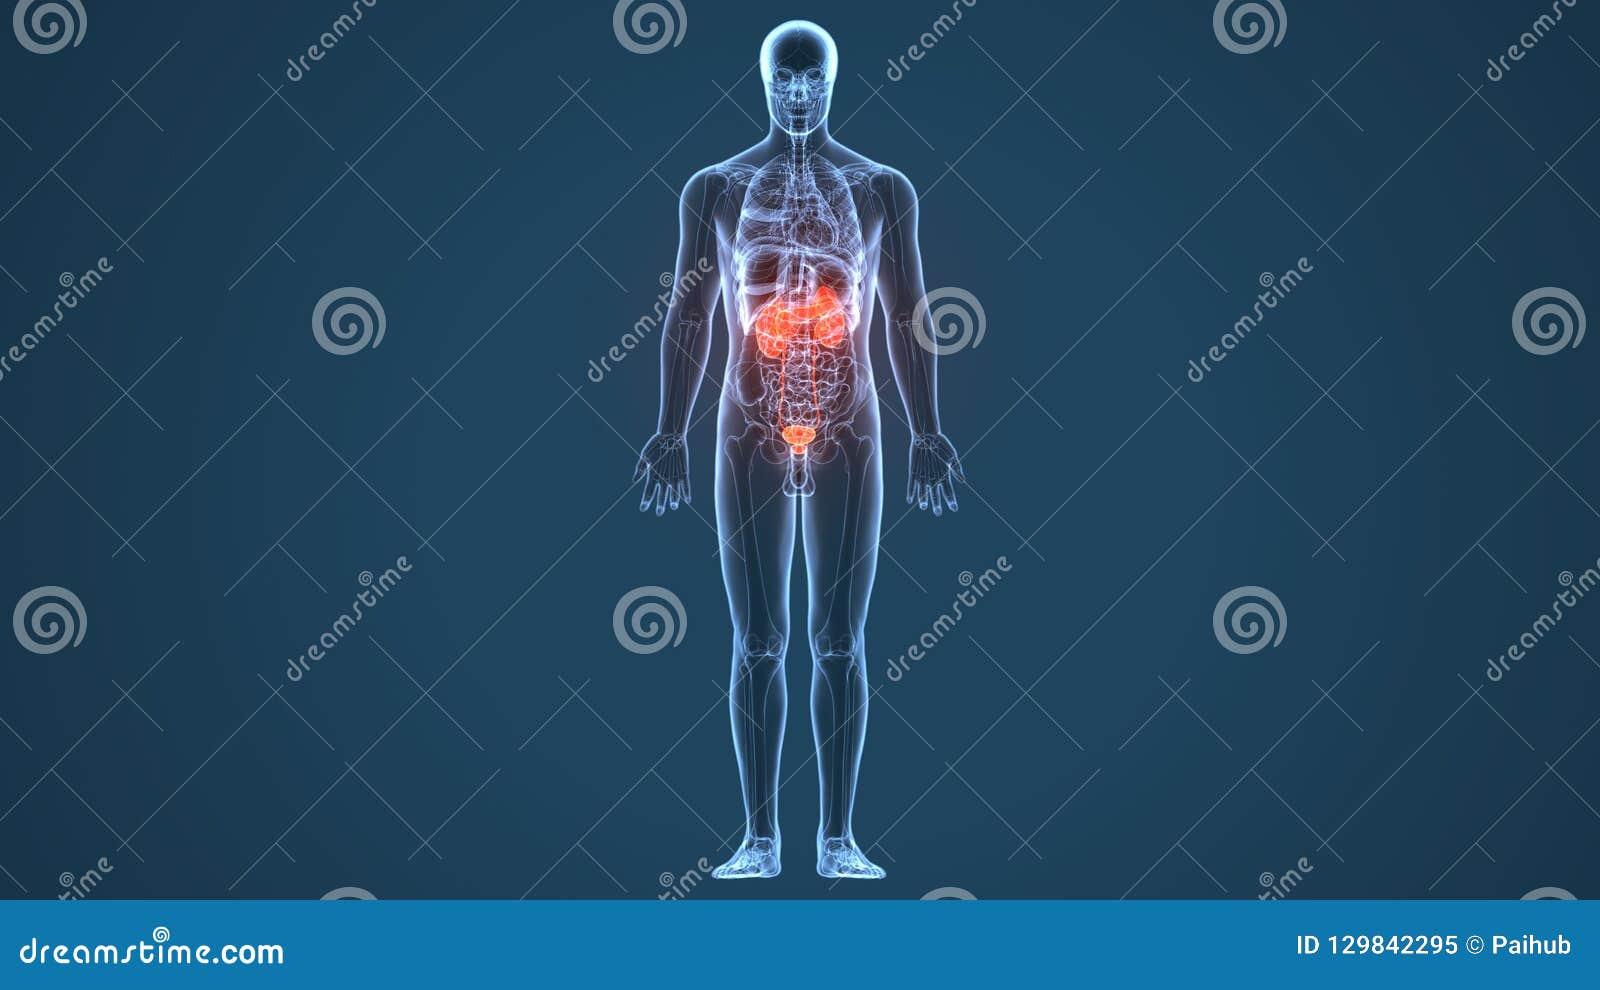 3d Illustration Of Human Body Kidneys Anatomy Stock Illustration